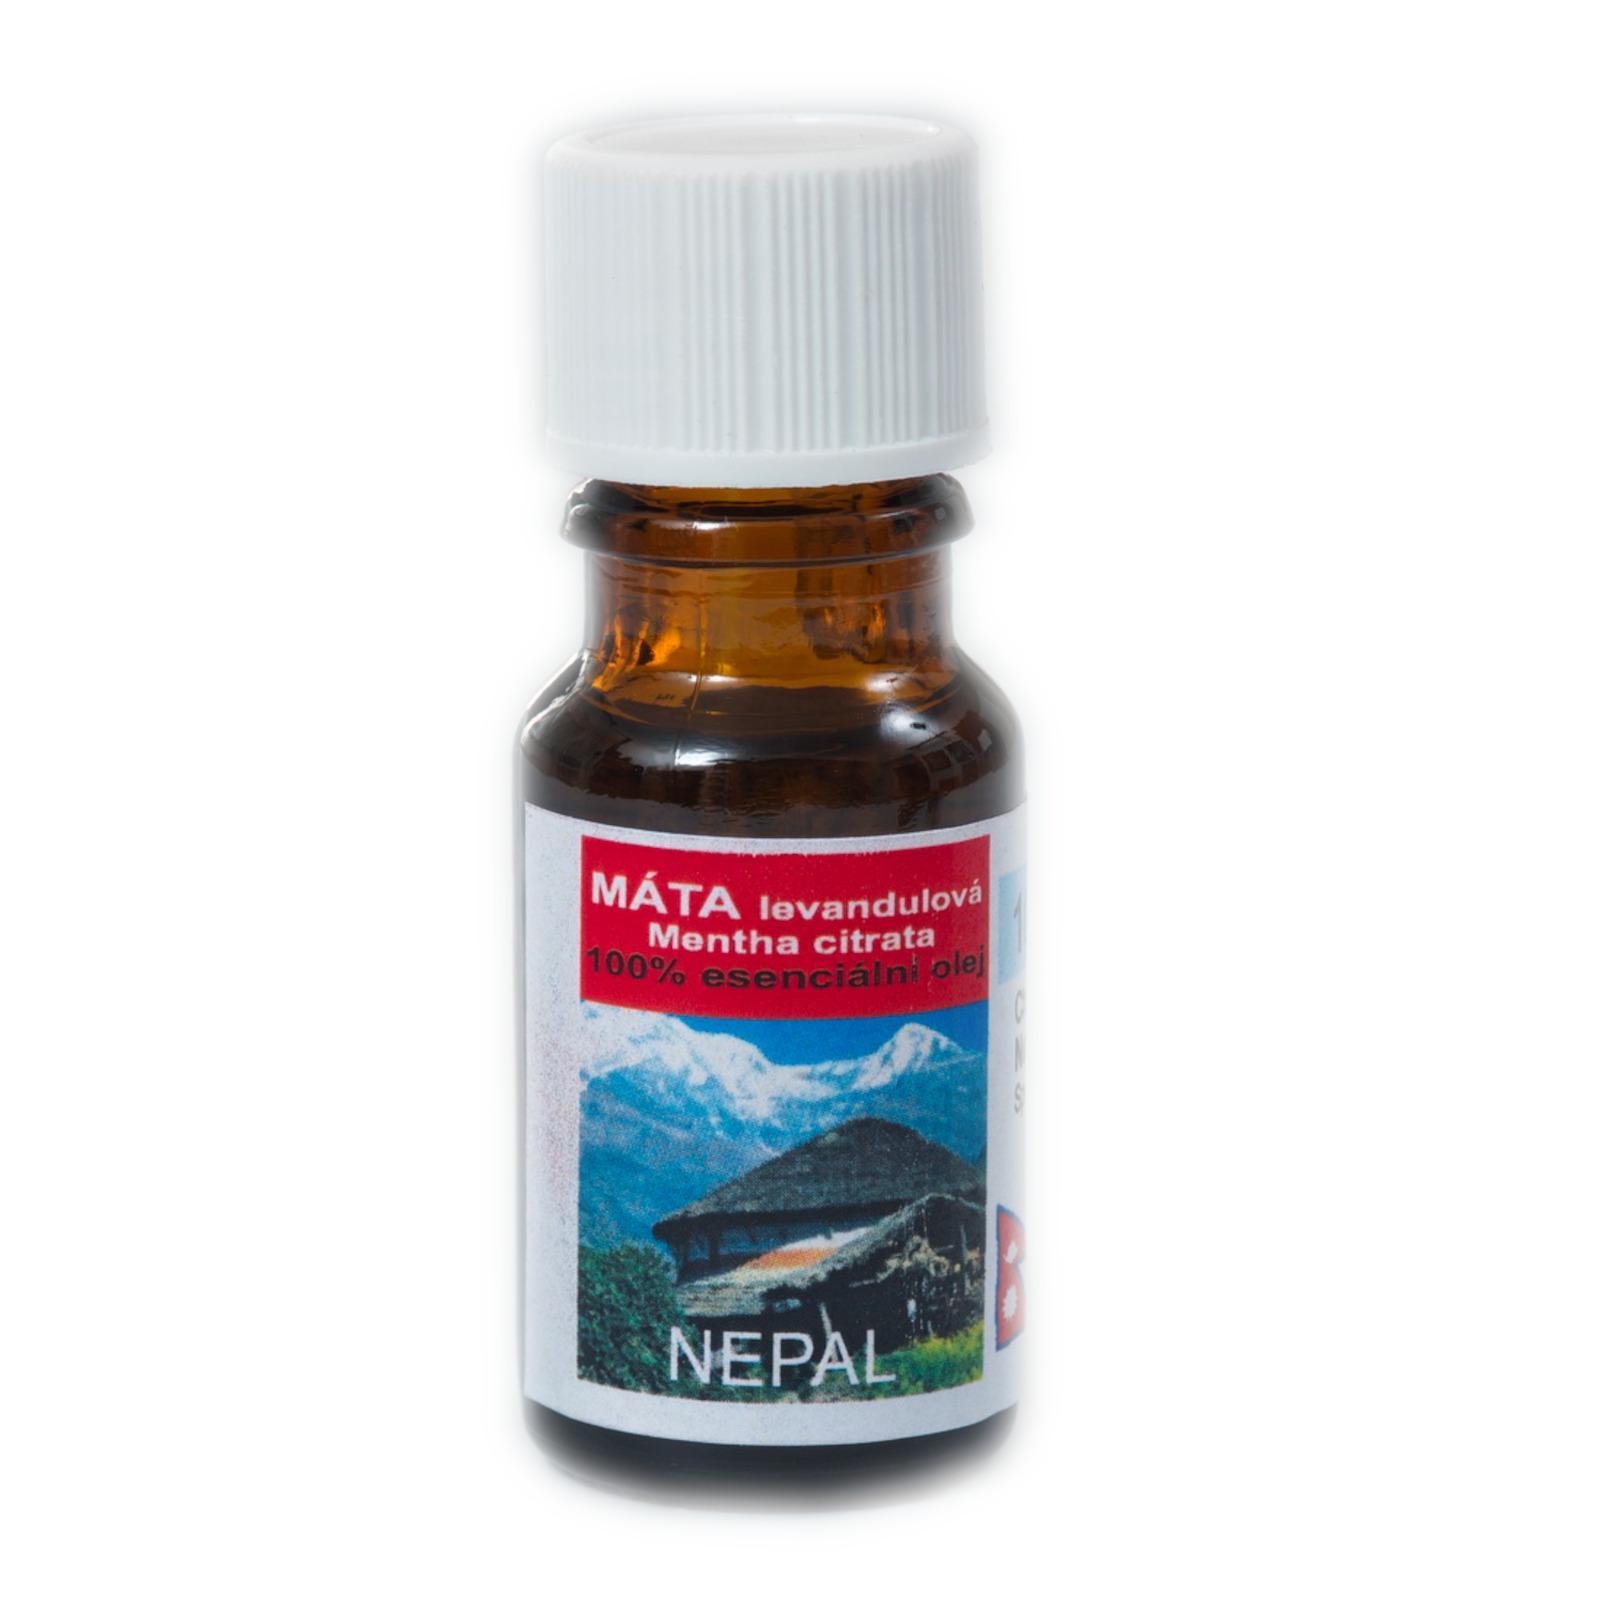 Chaudhary Biosys Máta levandulová, citrata 10 ml